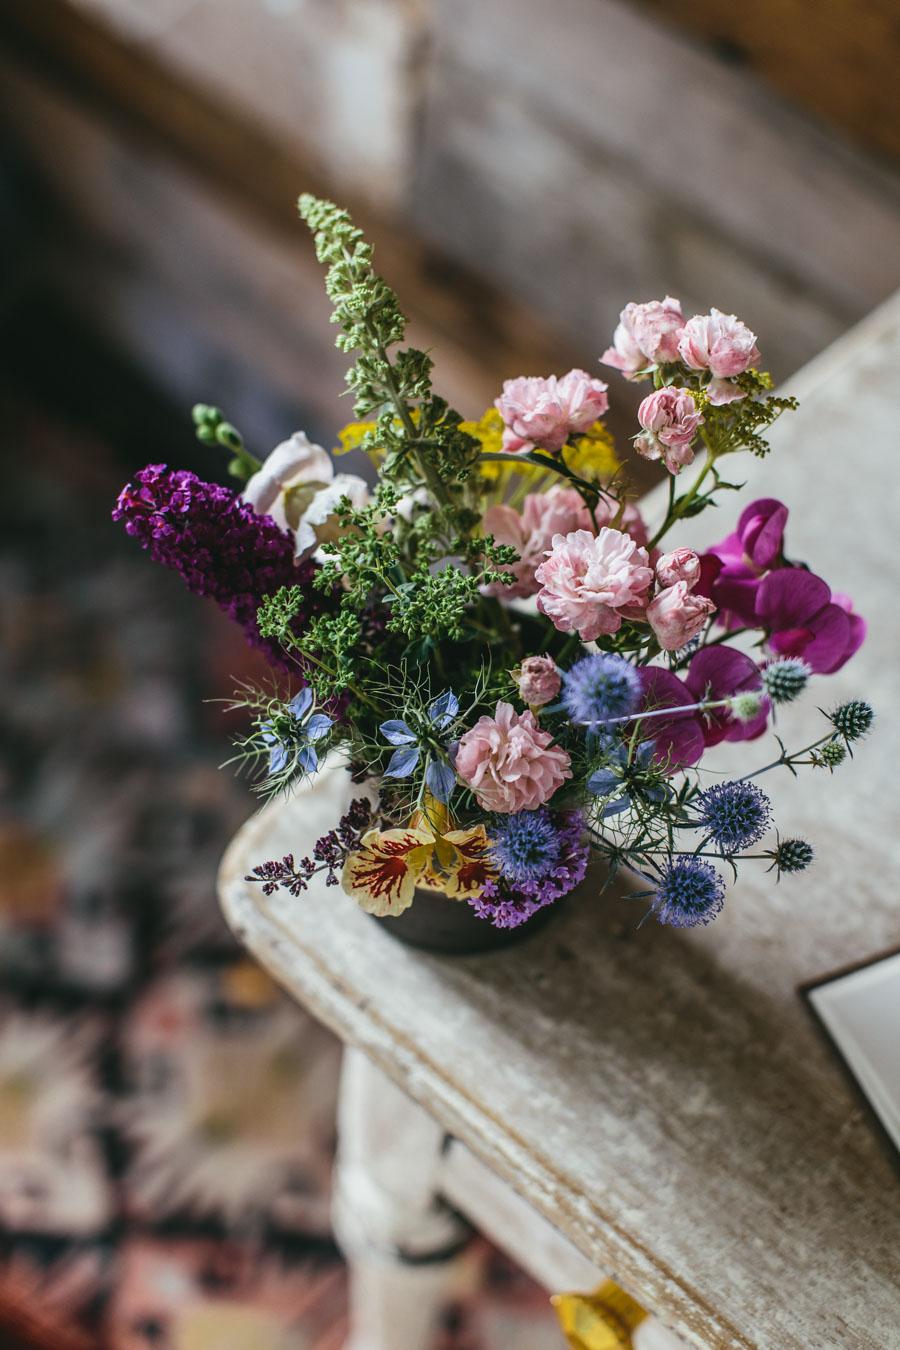 Garden bounty - Home grown flowers